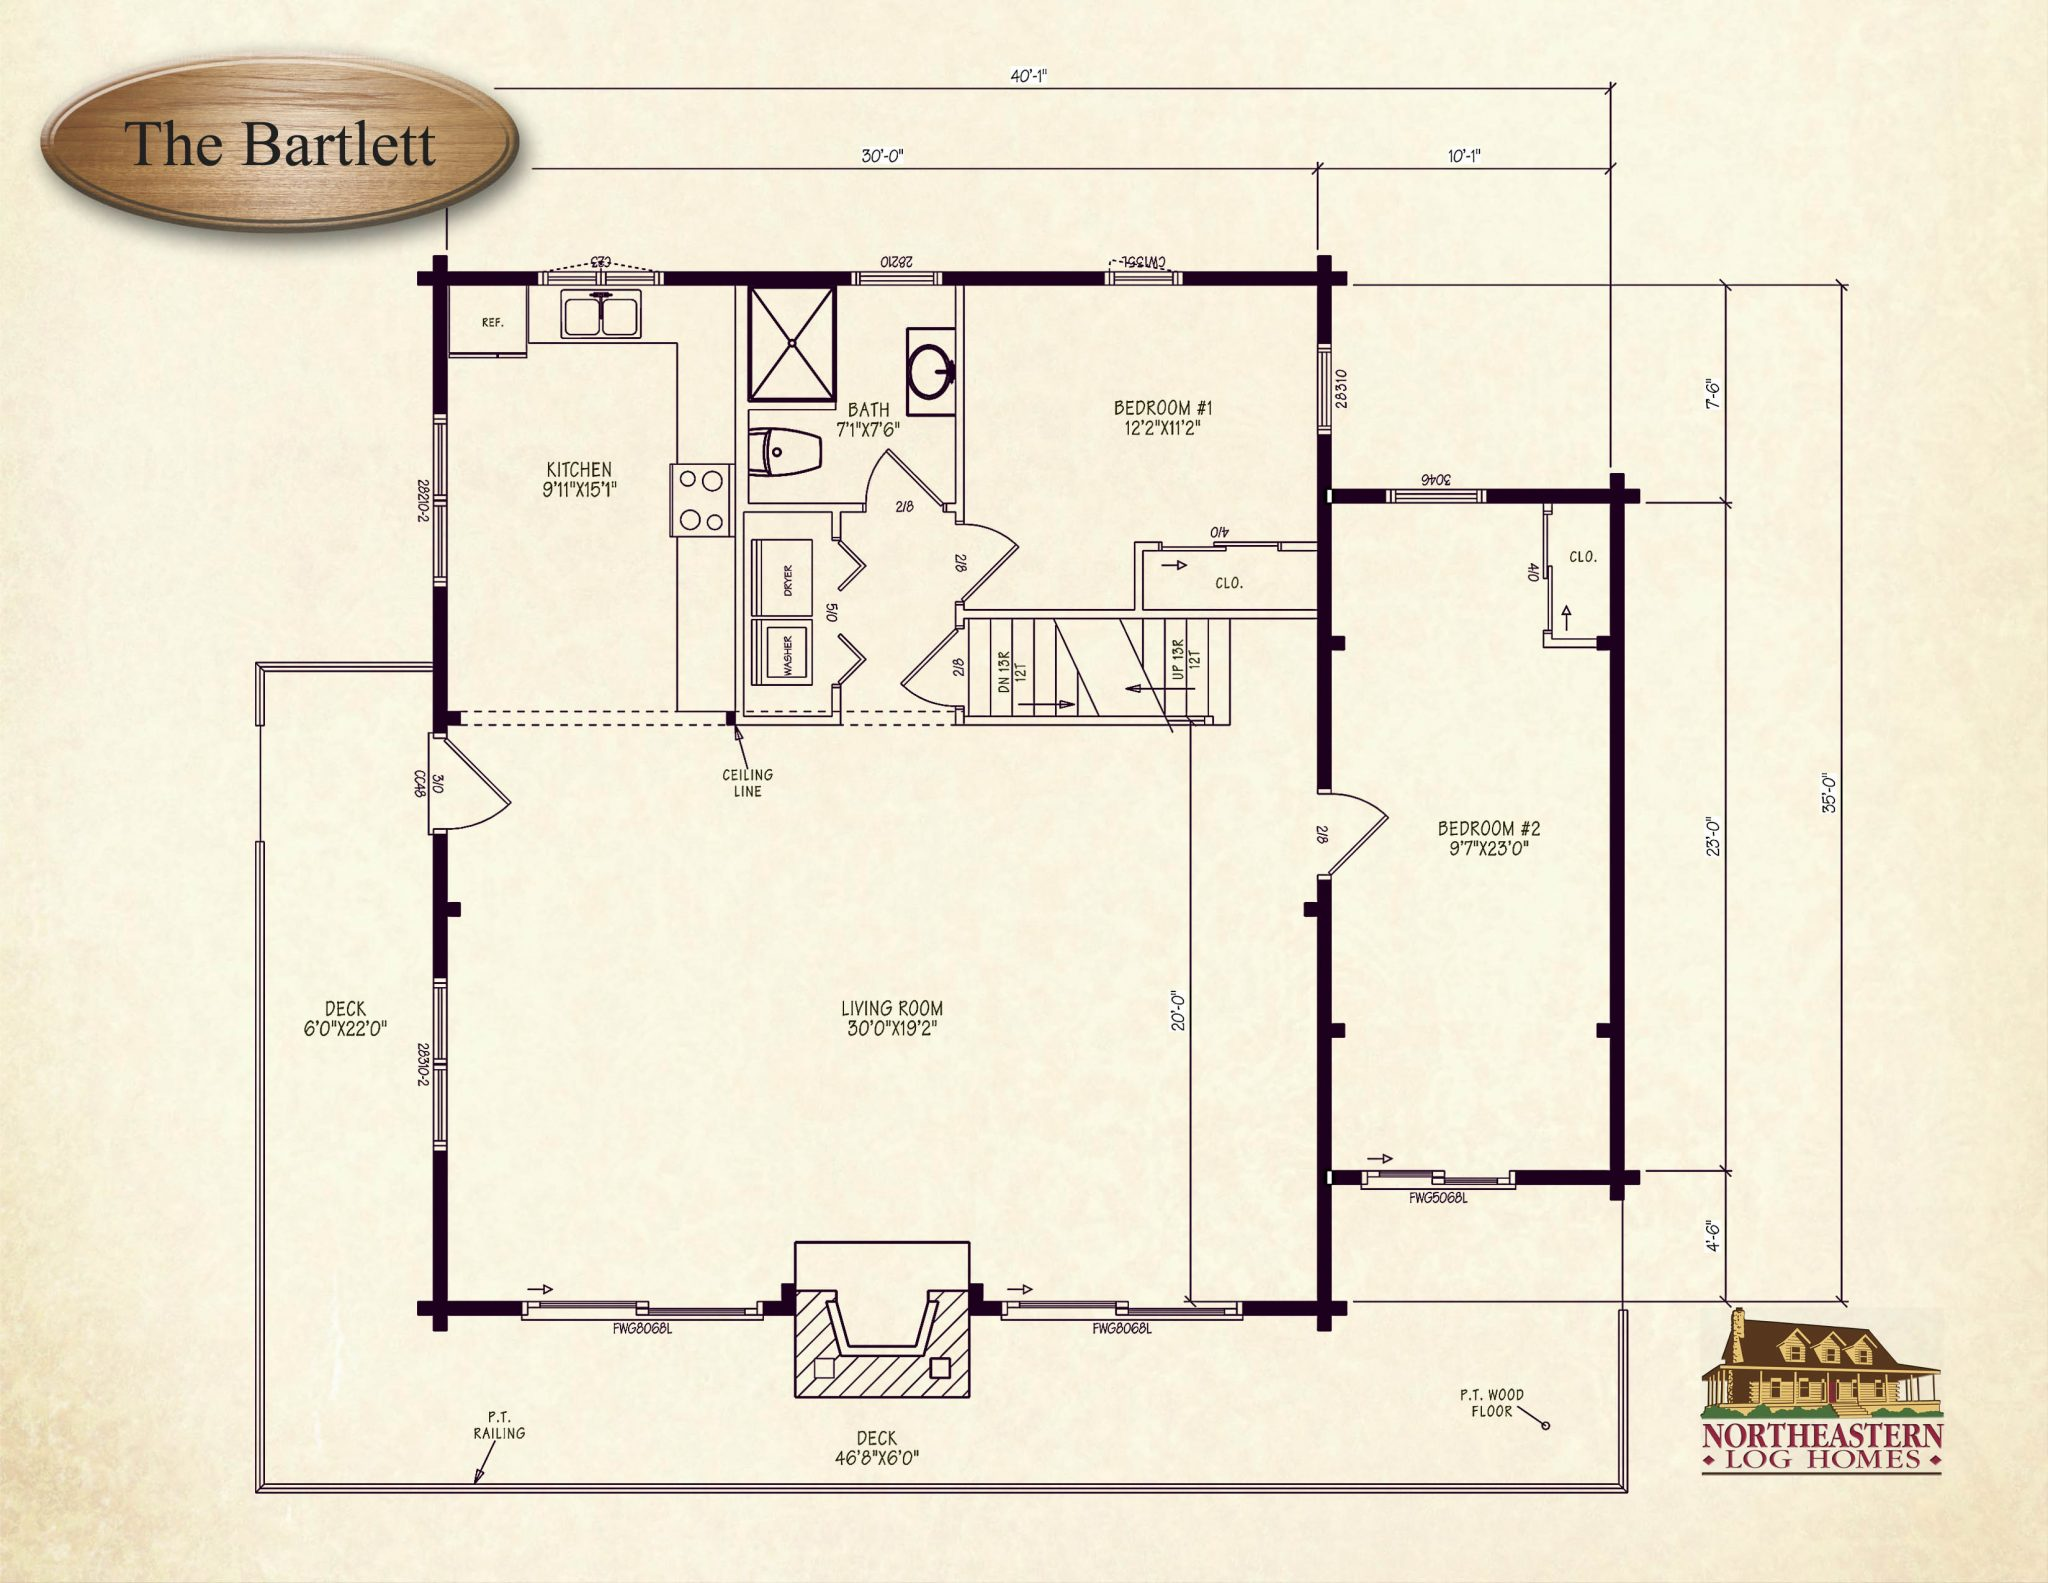 The Bartlett Northeastern Log Homes